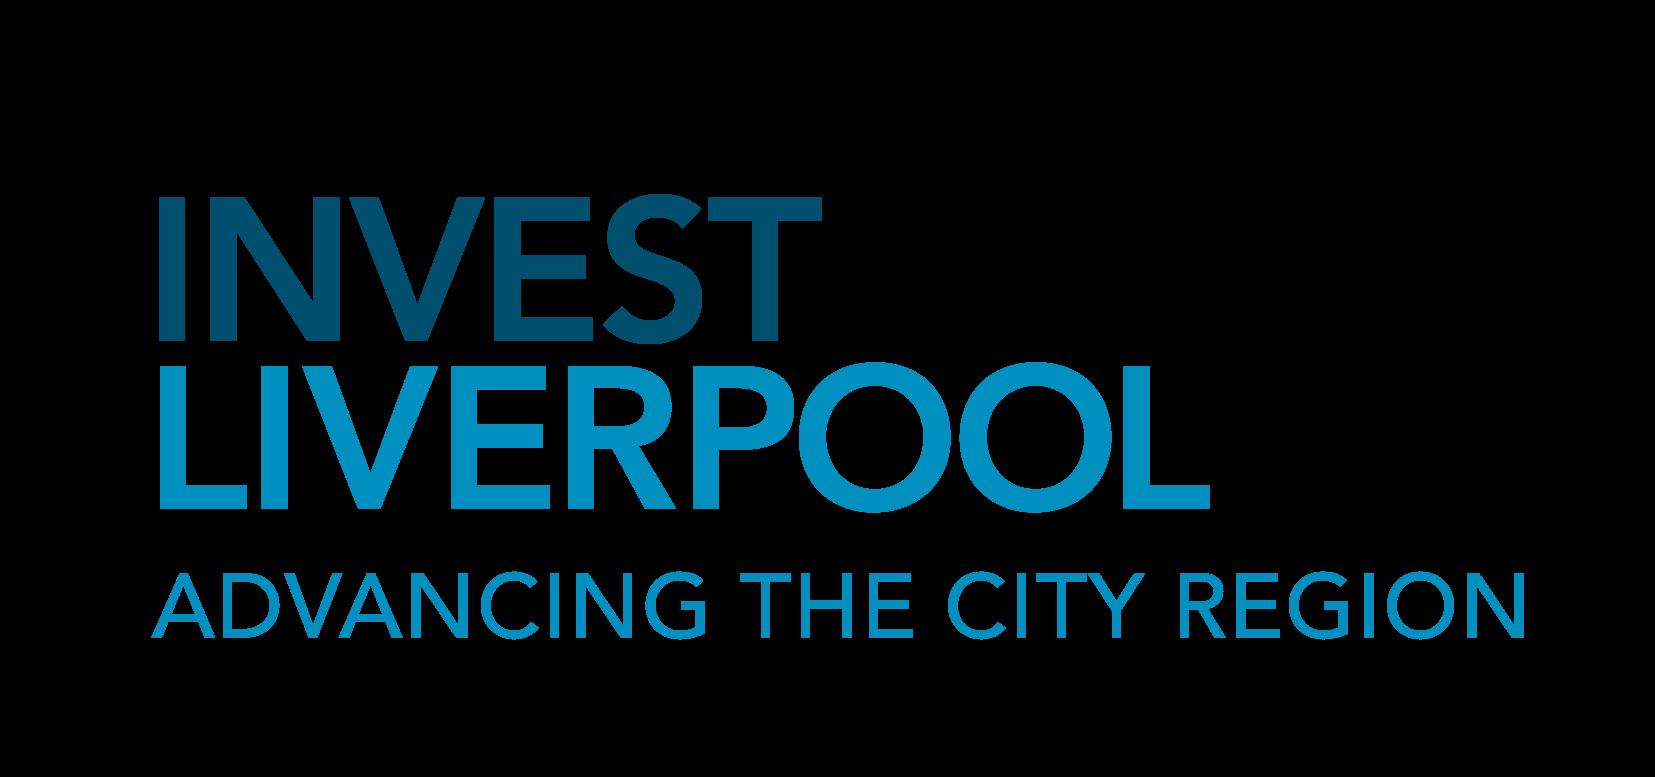 Invest Liverpool